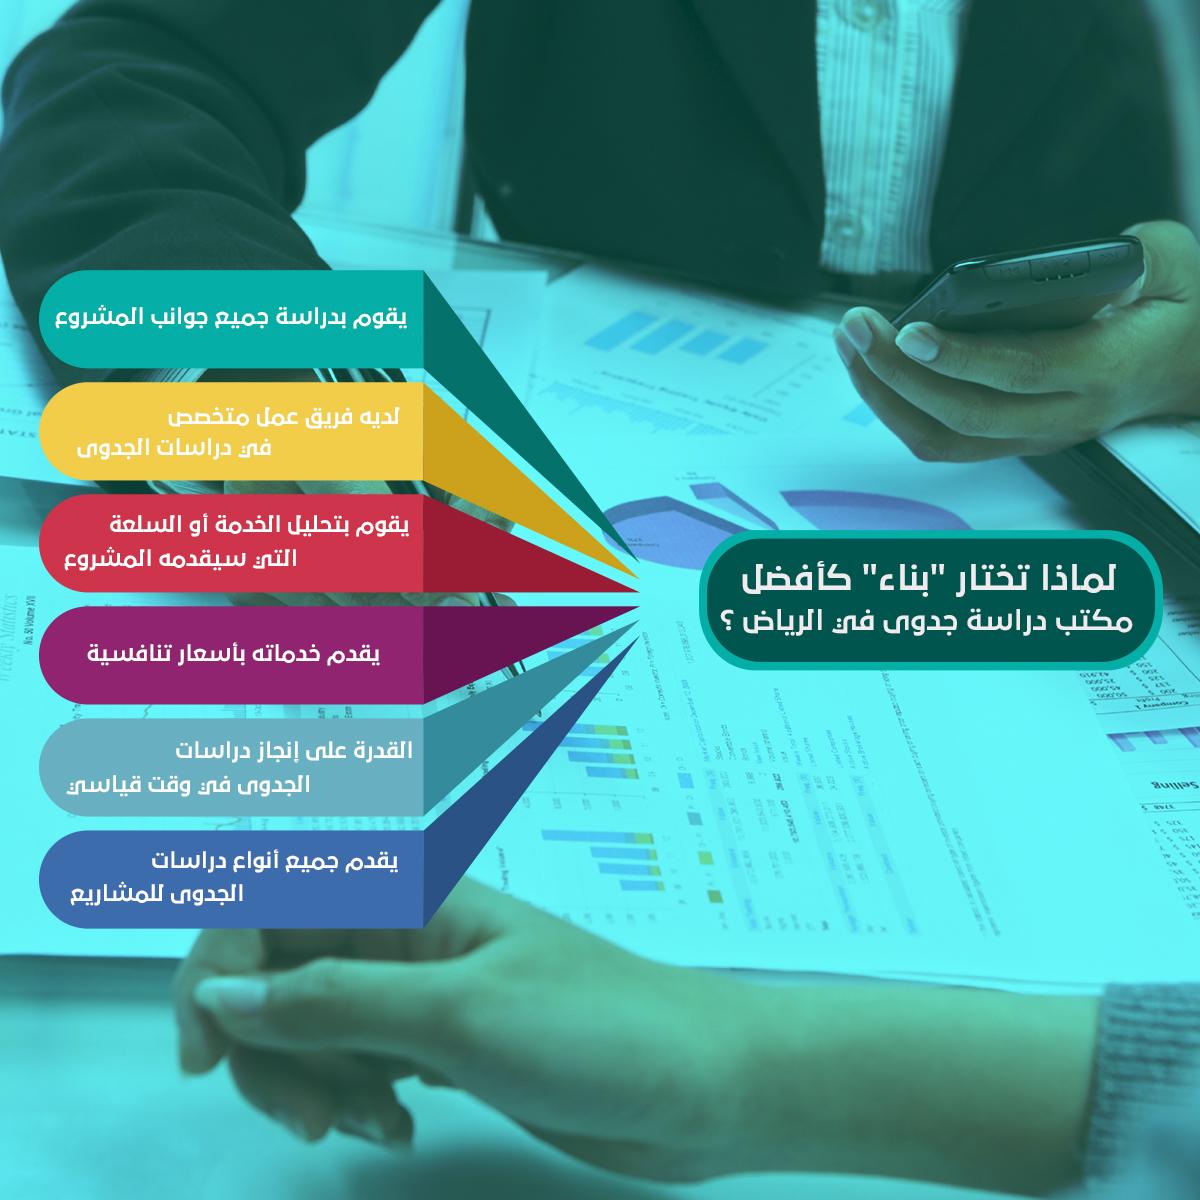 ingo - هل تبحث عن مكتب دراسات جدوى معتمد في الرياض؟